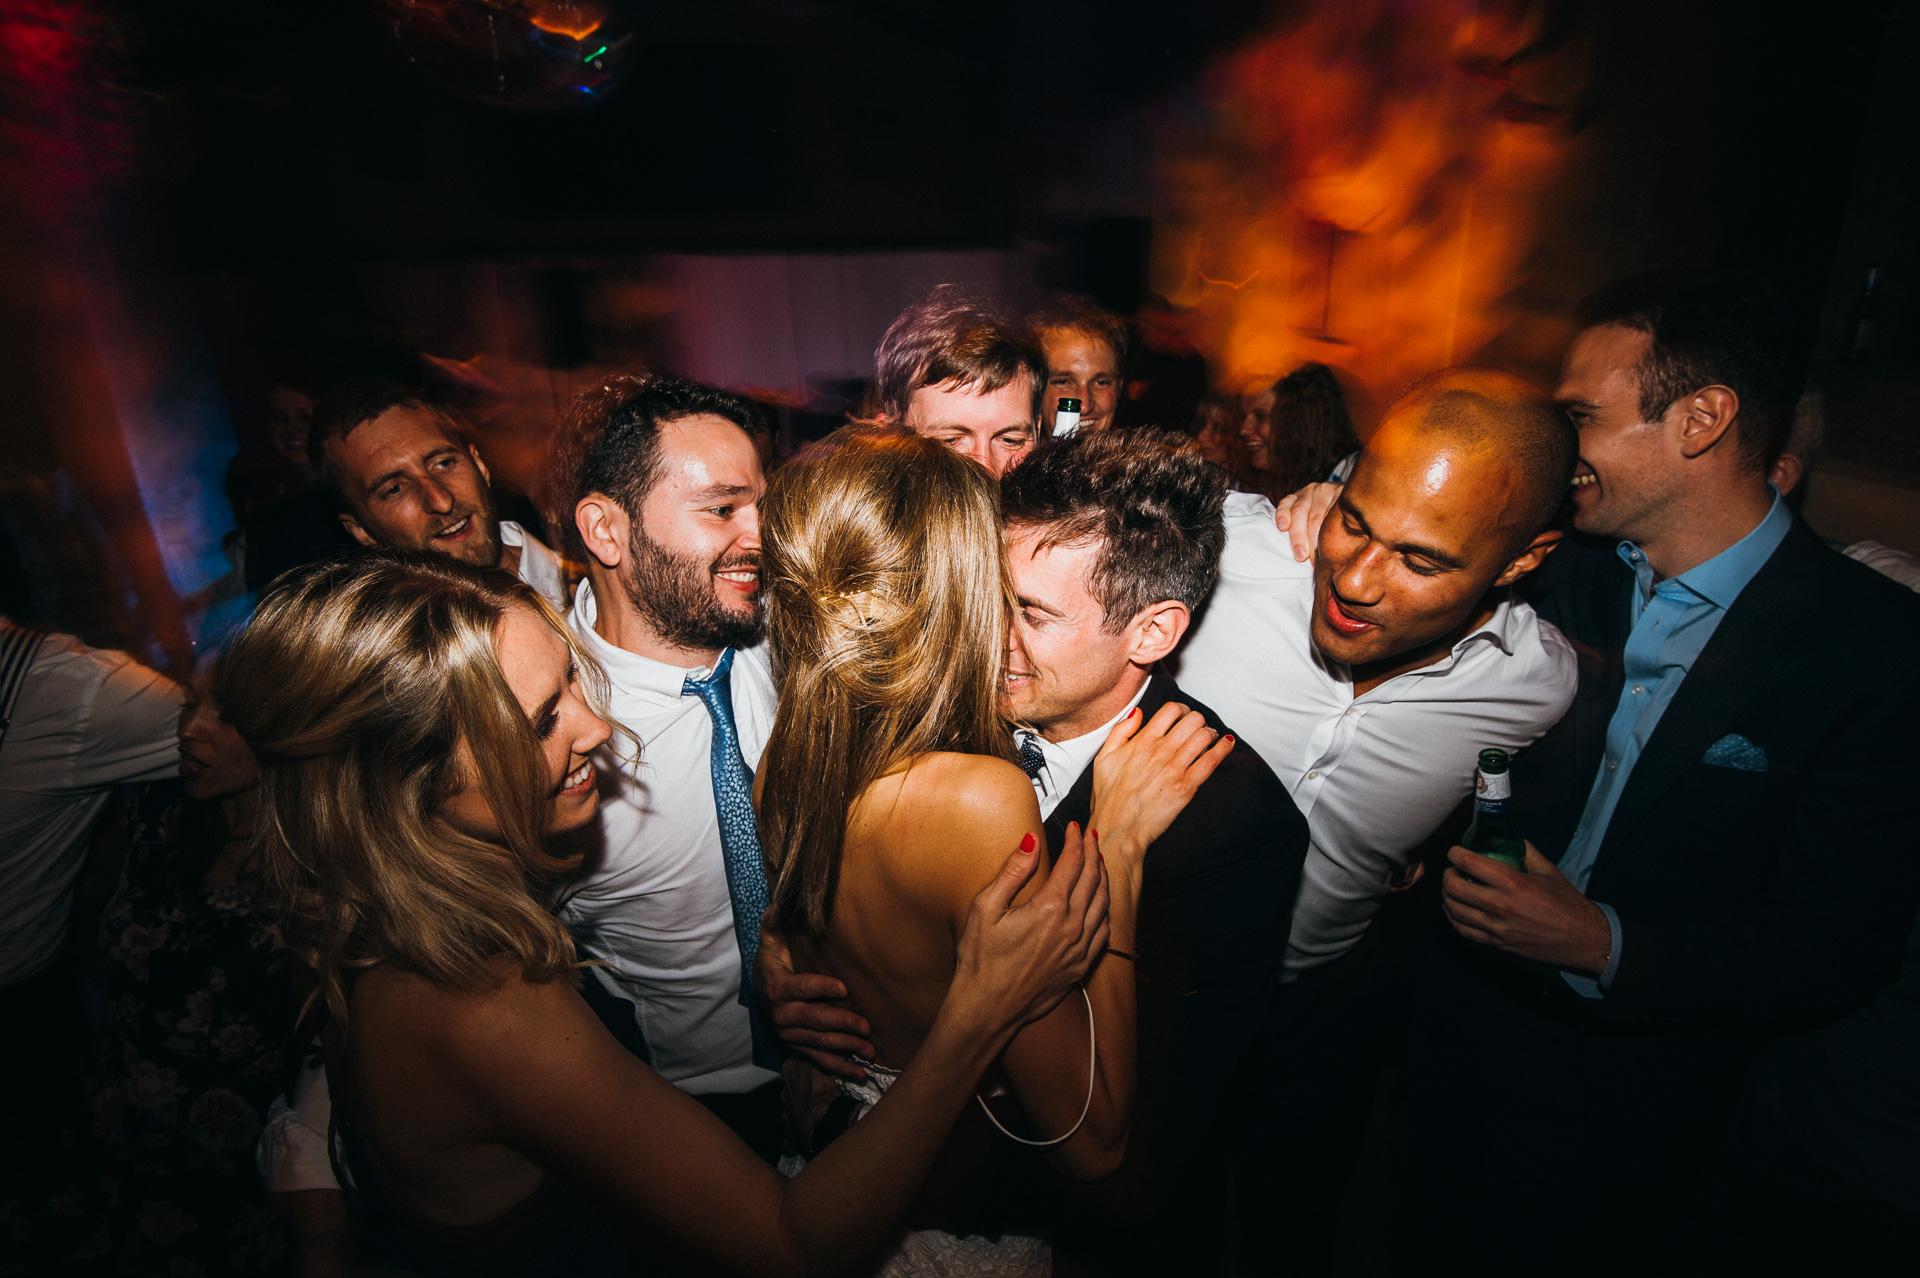 Sudeley castle wedding dancing